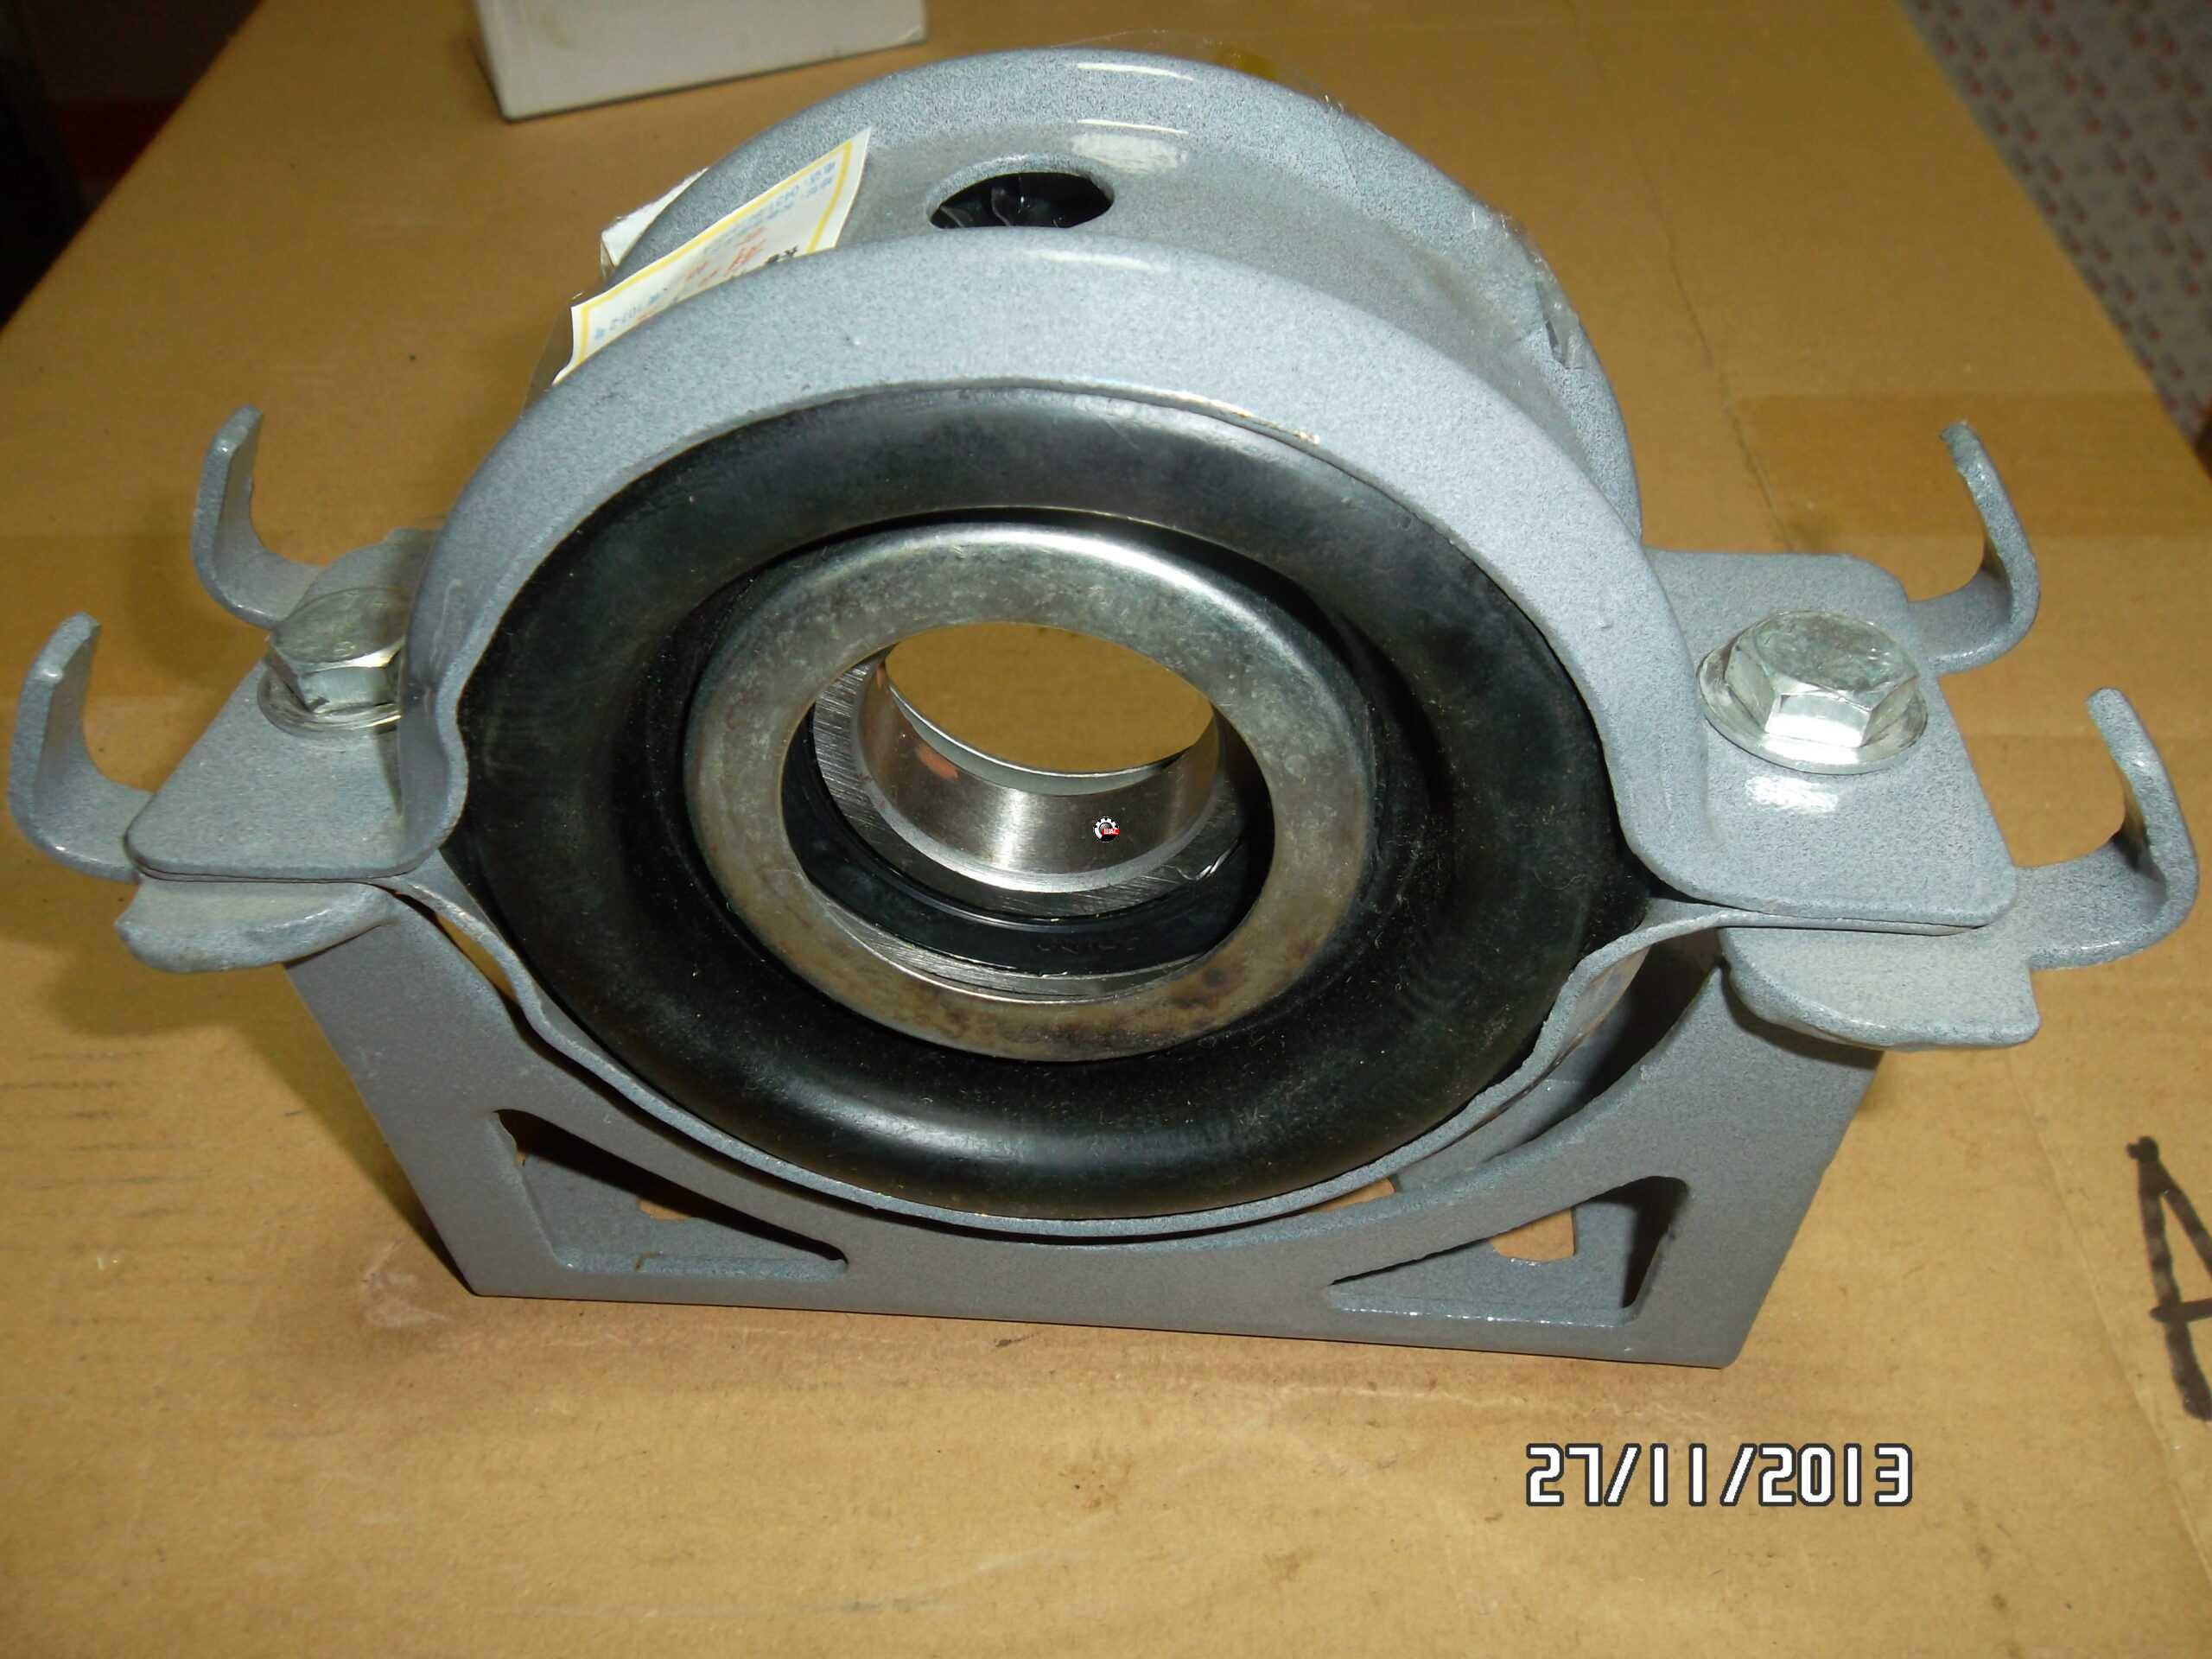 FAW (ФАВ) 1041 (V=3.17L) Опора подвесная вала карданного